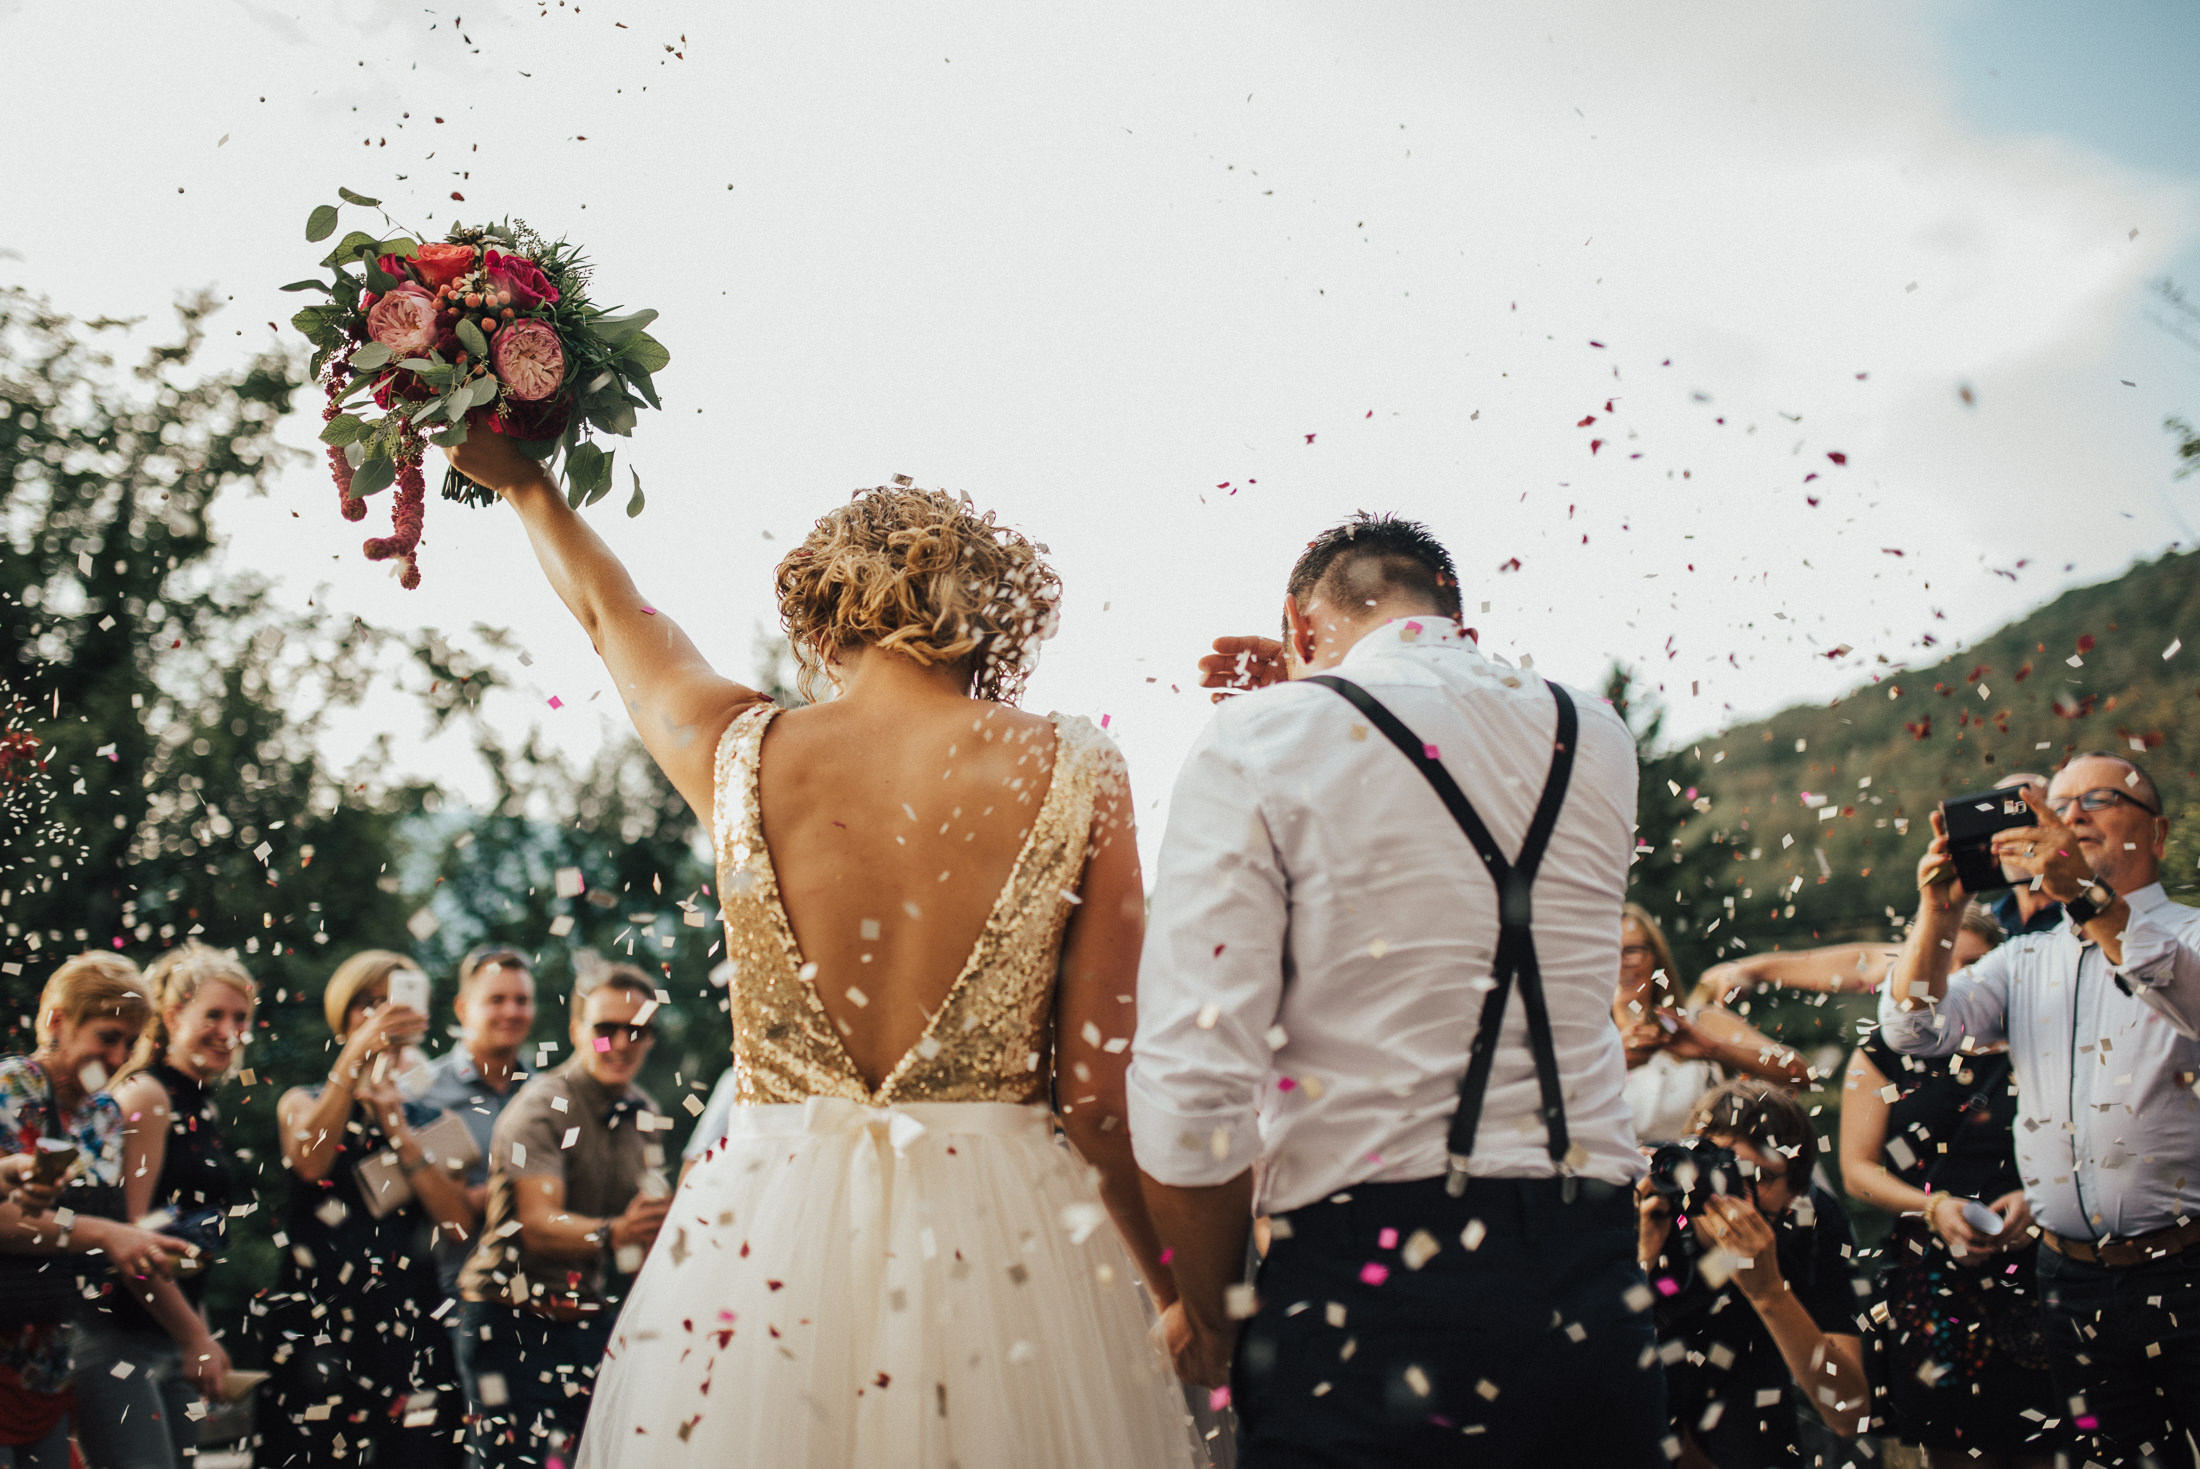 Cum alegi formatia pentru nunta?